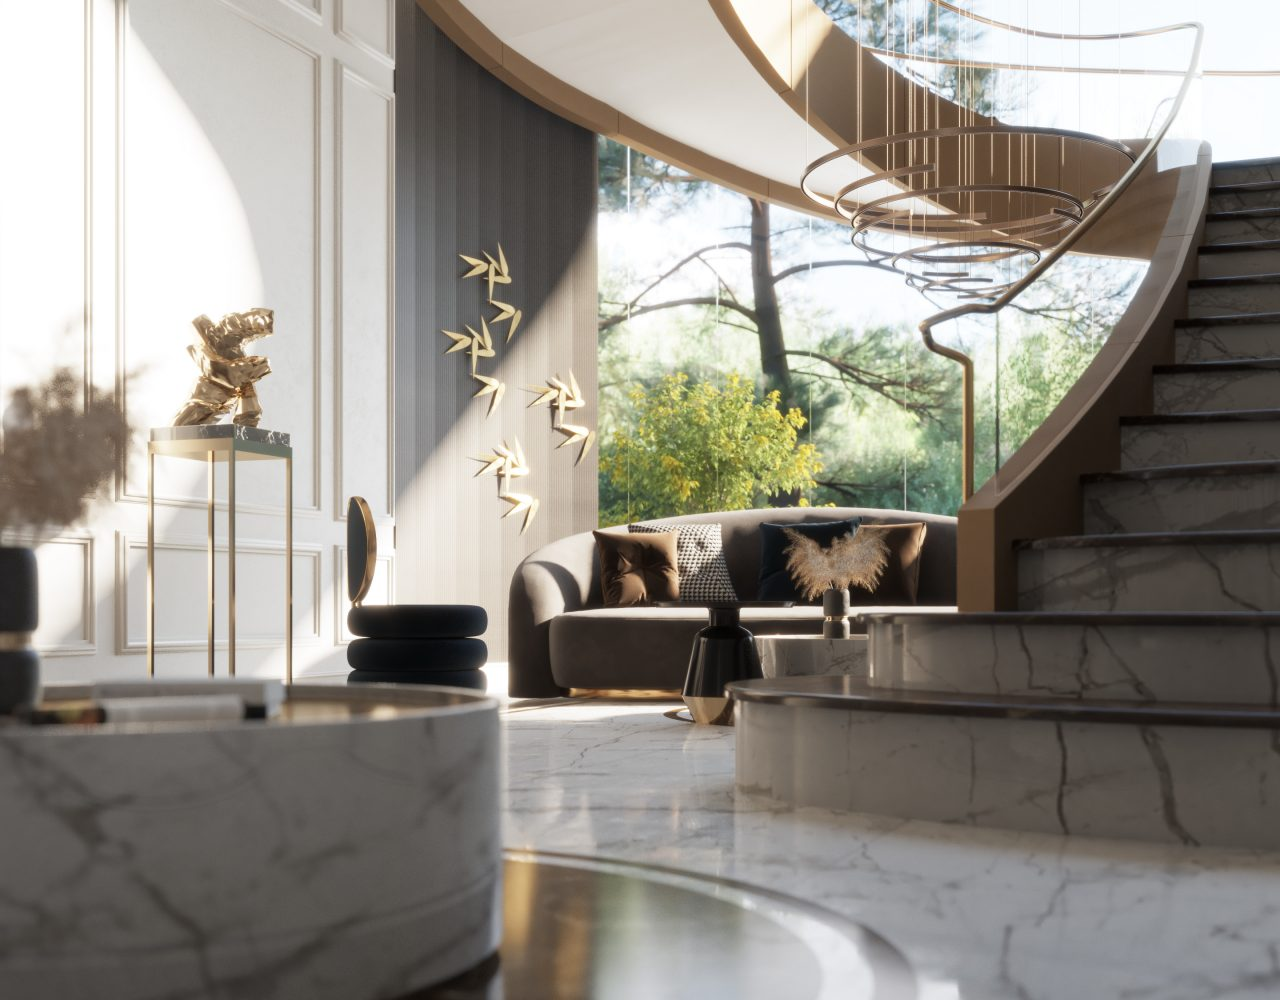 HIGH CLASS MAIN HALL -sun light - stairs - wall design - marble floor